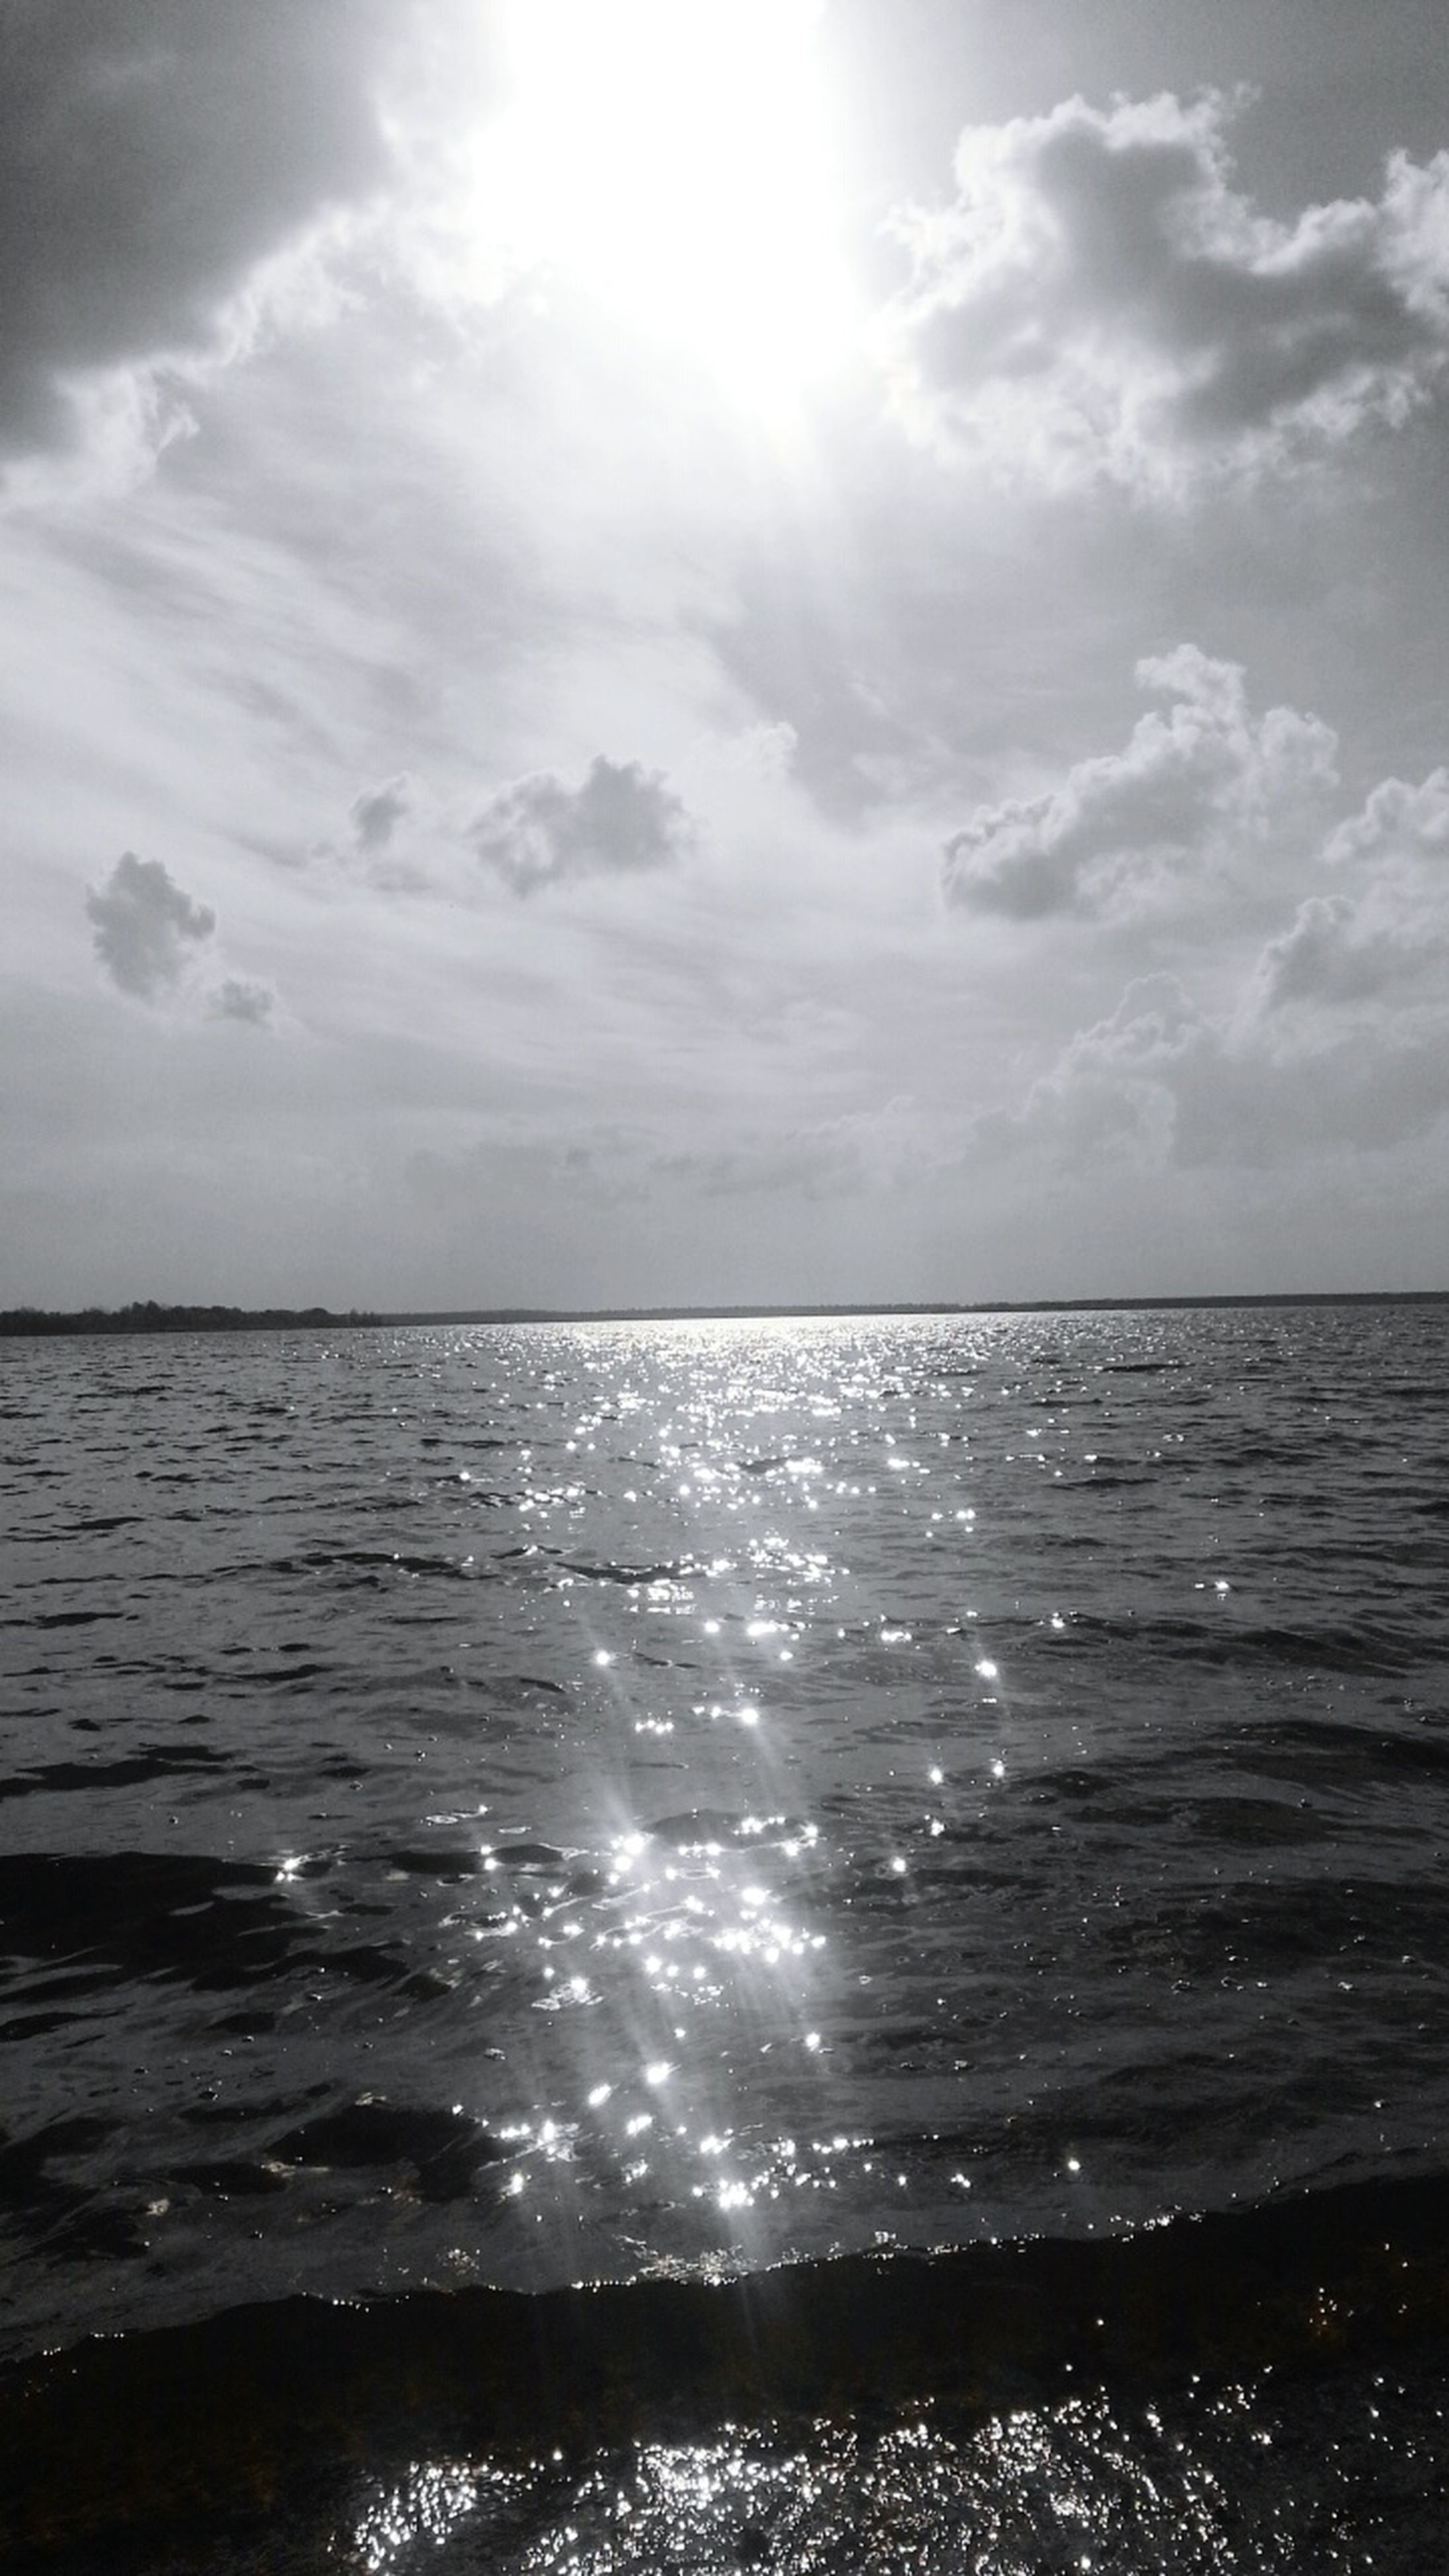 sea, water, horizon over water, sky, tranquil scene, scenics, tranquility, beauty in nature, sun, nature, cloud - sky, beach, waterfront, reflection, sunlight, idyllic, seascape, rippled, cloud, sunbeam